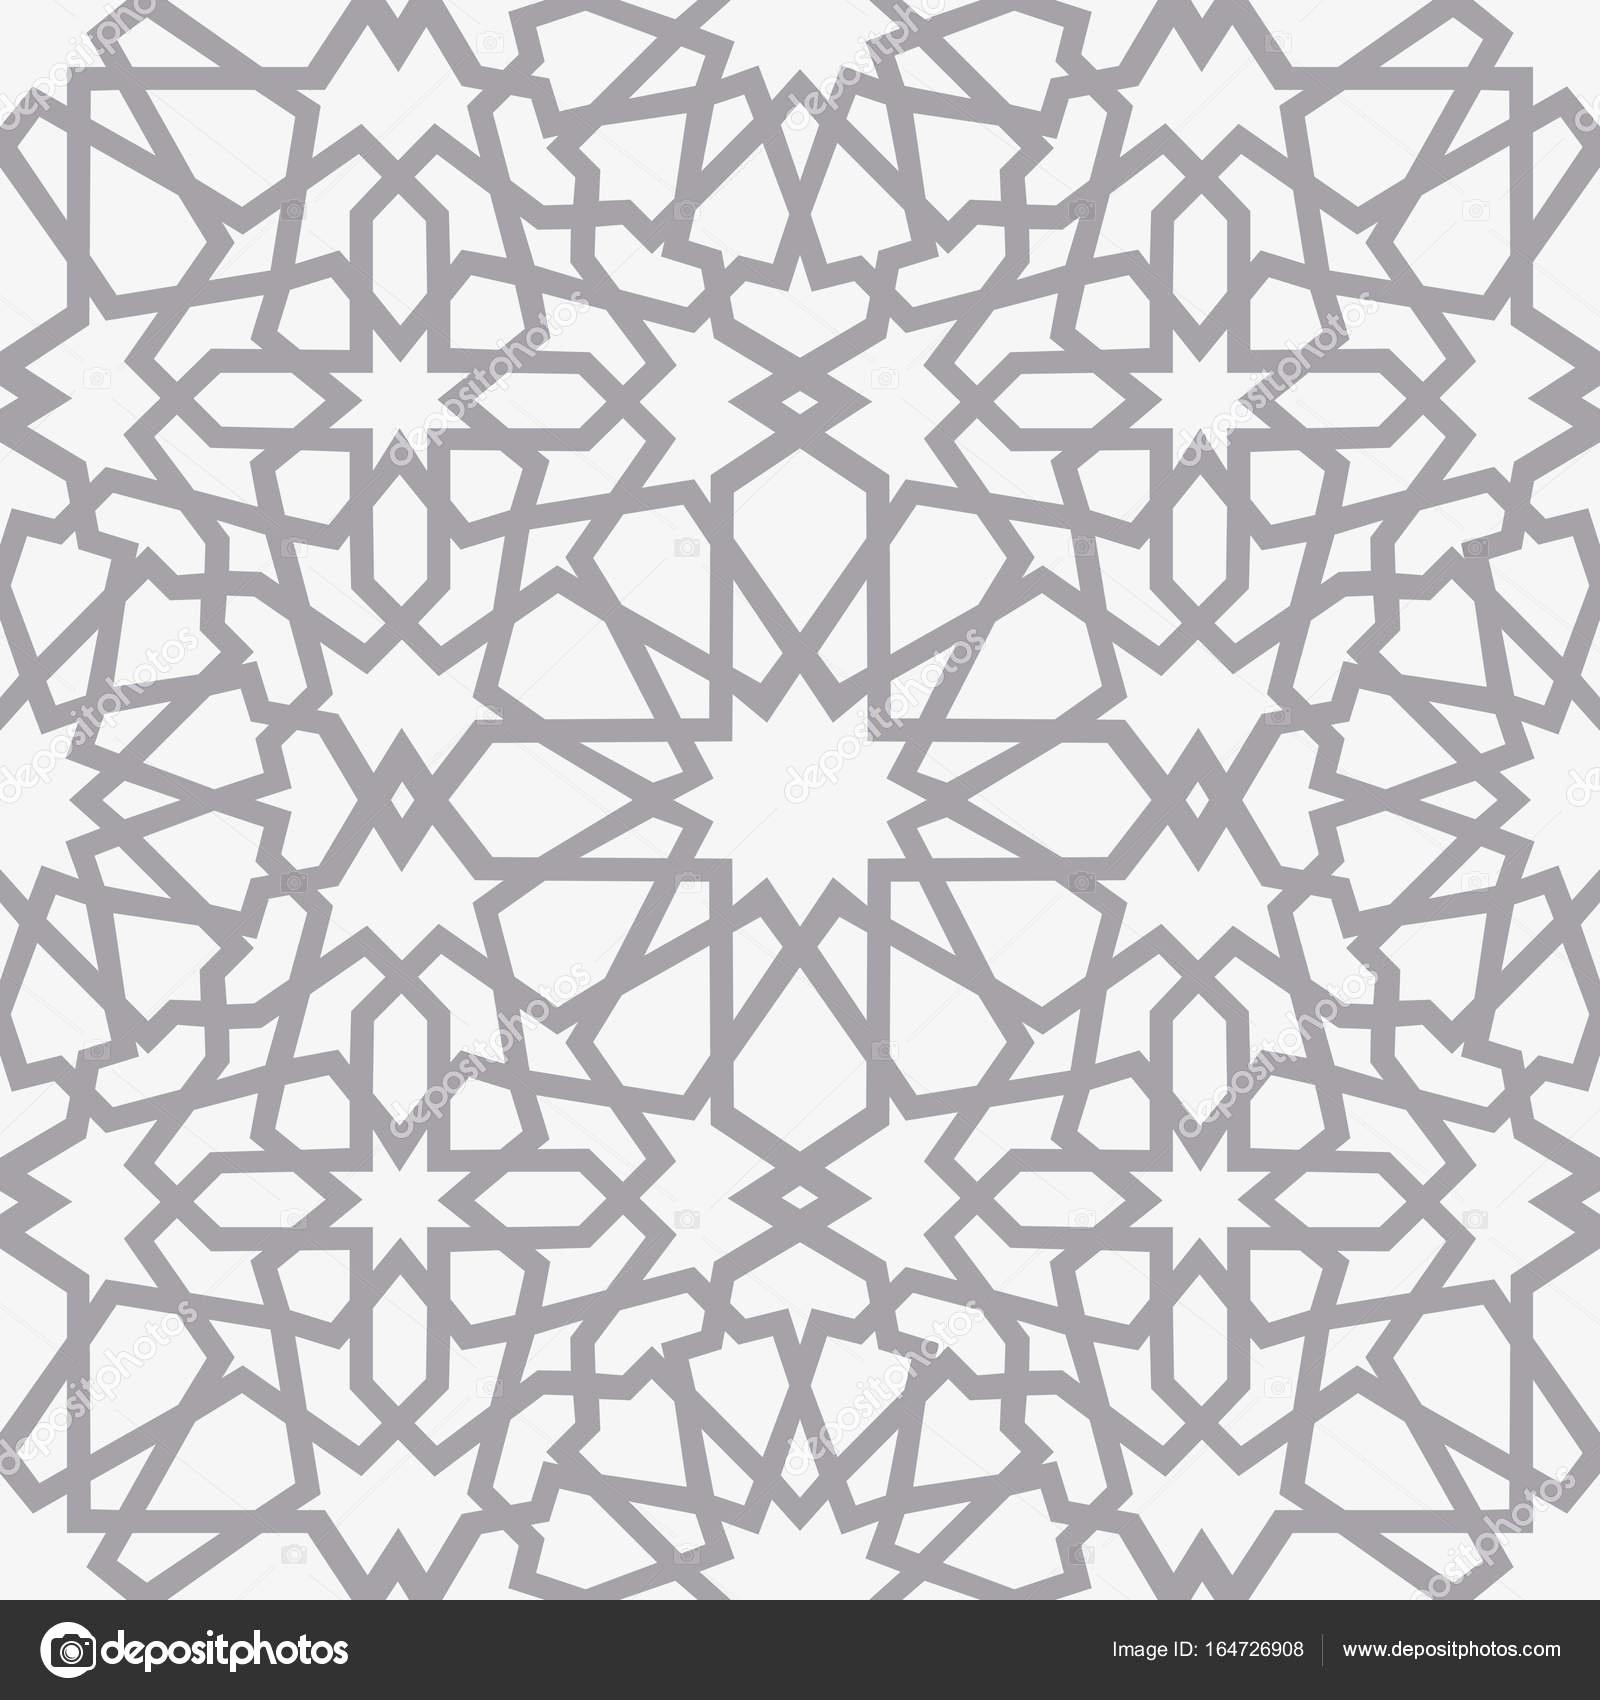 1600x1700 Geometrical Pattern Unique Geometric Patterns Coloring Pages